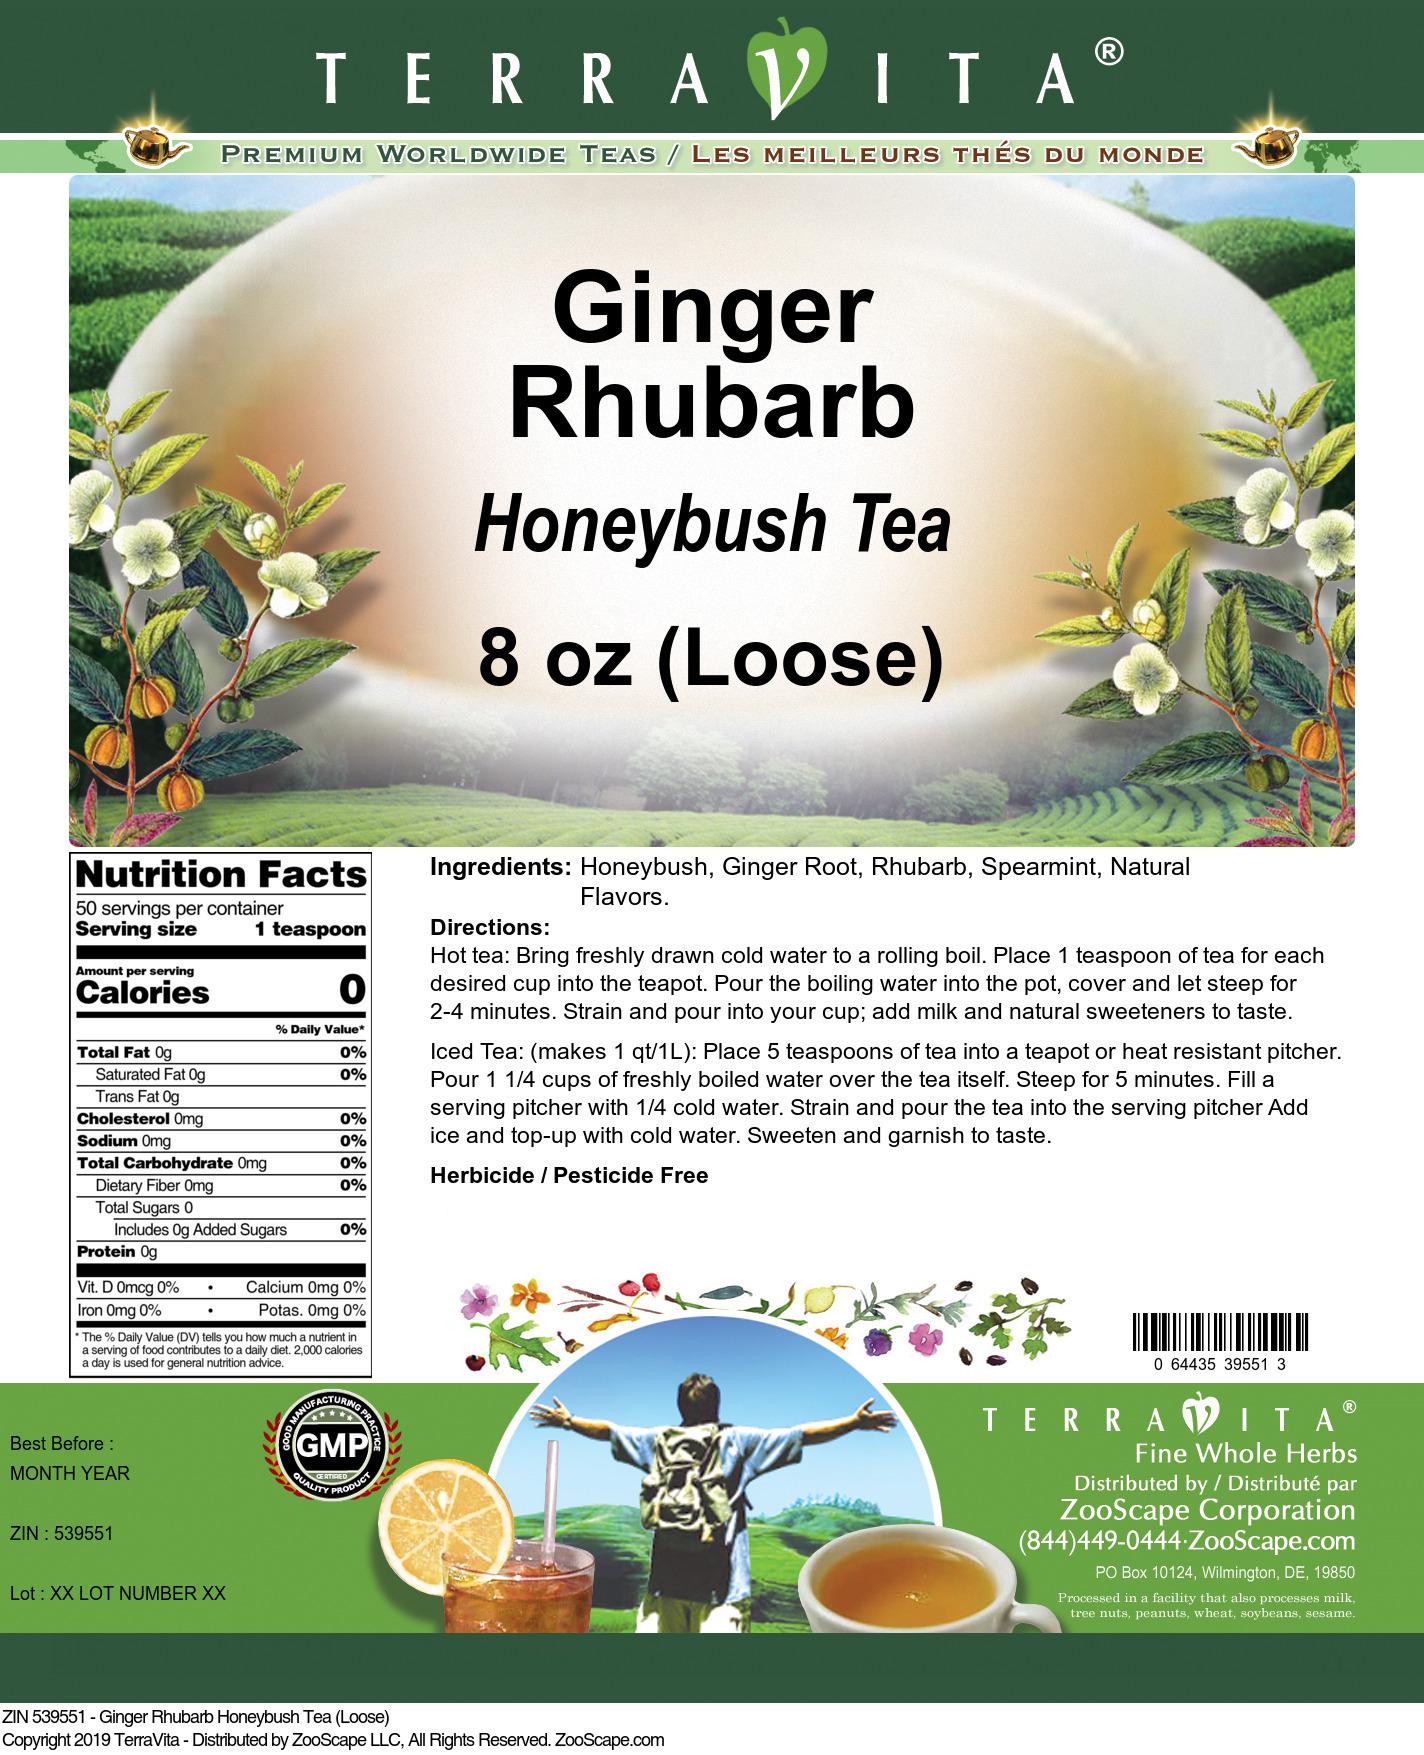 Ginger Rhubarb Honeybush Tea